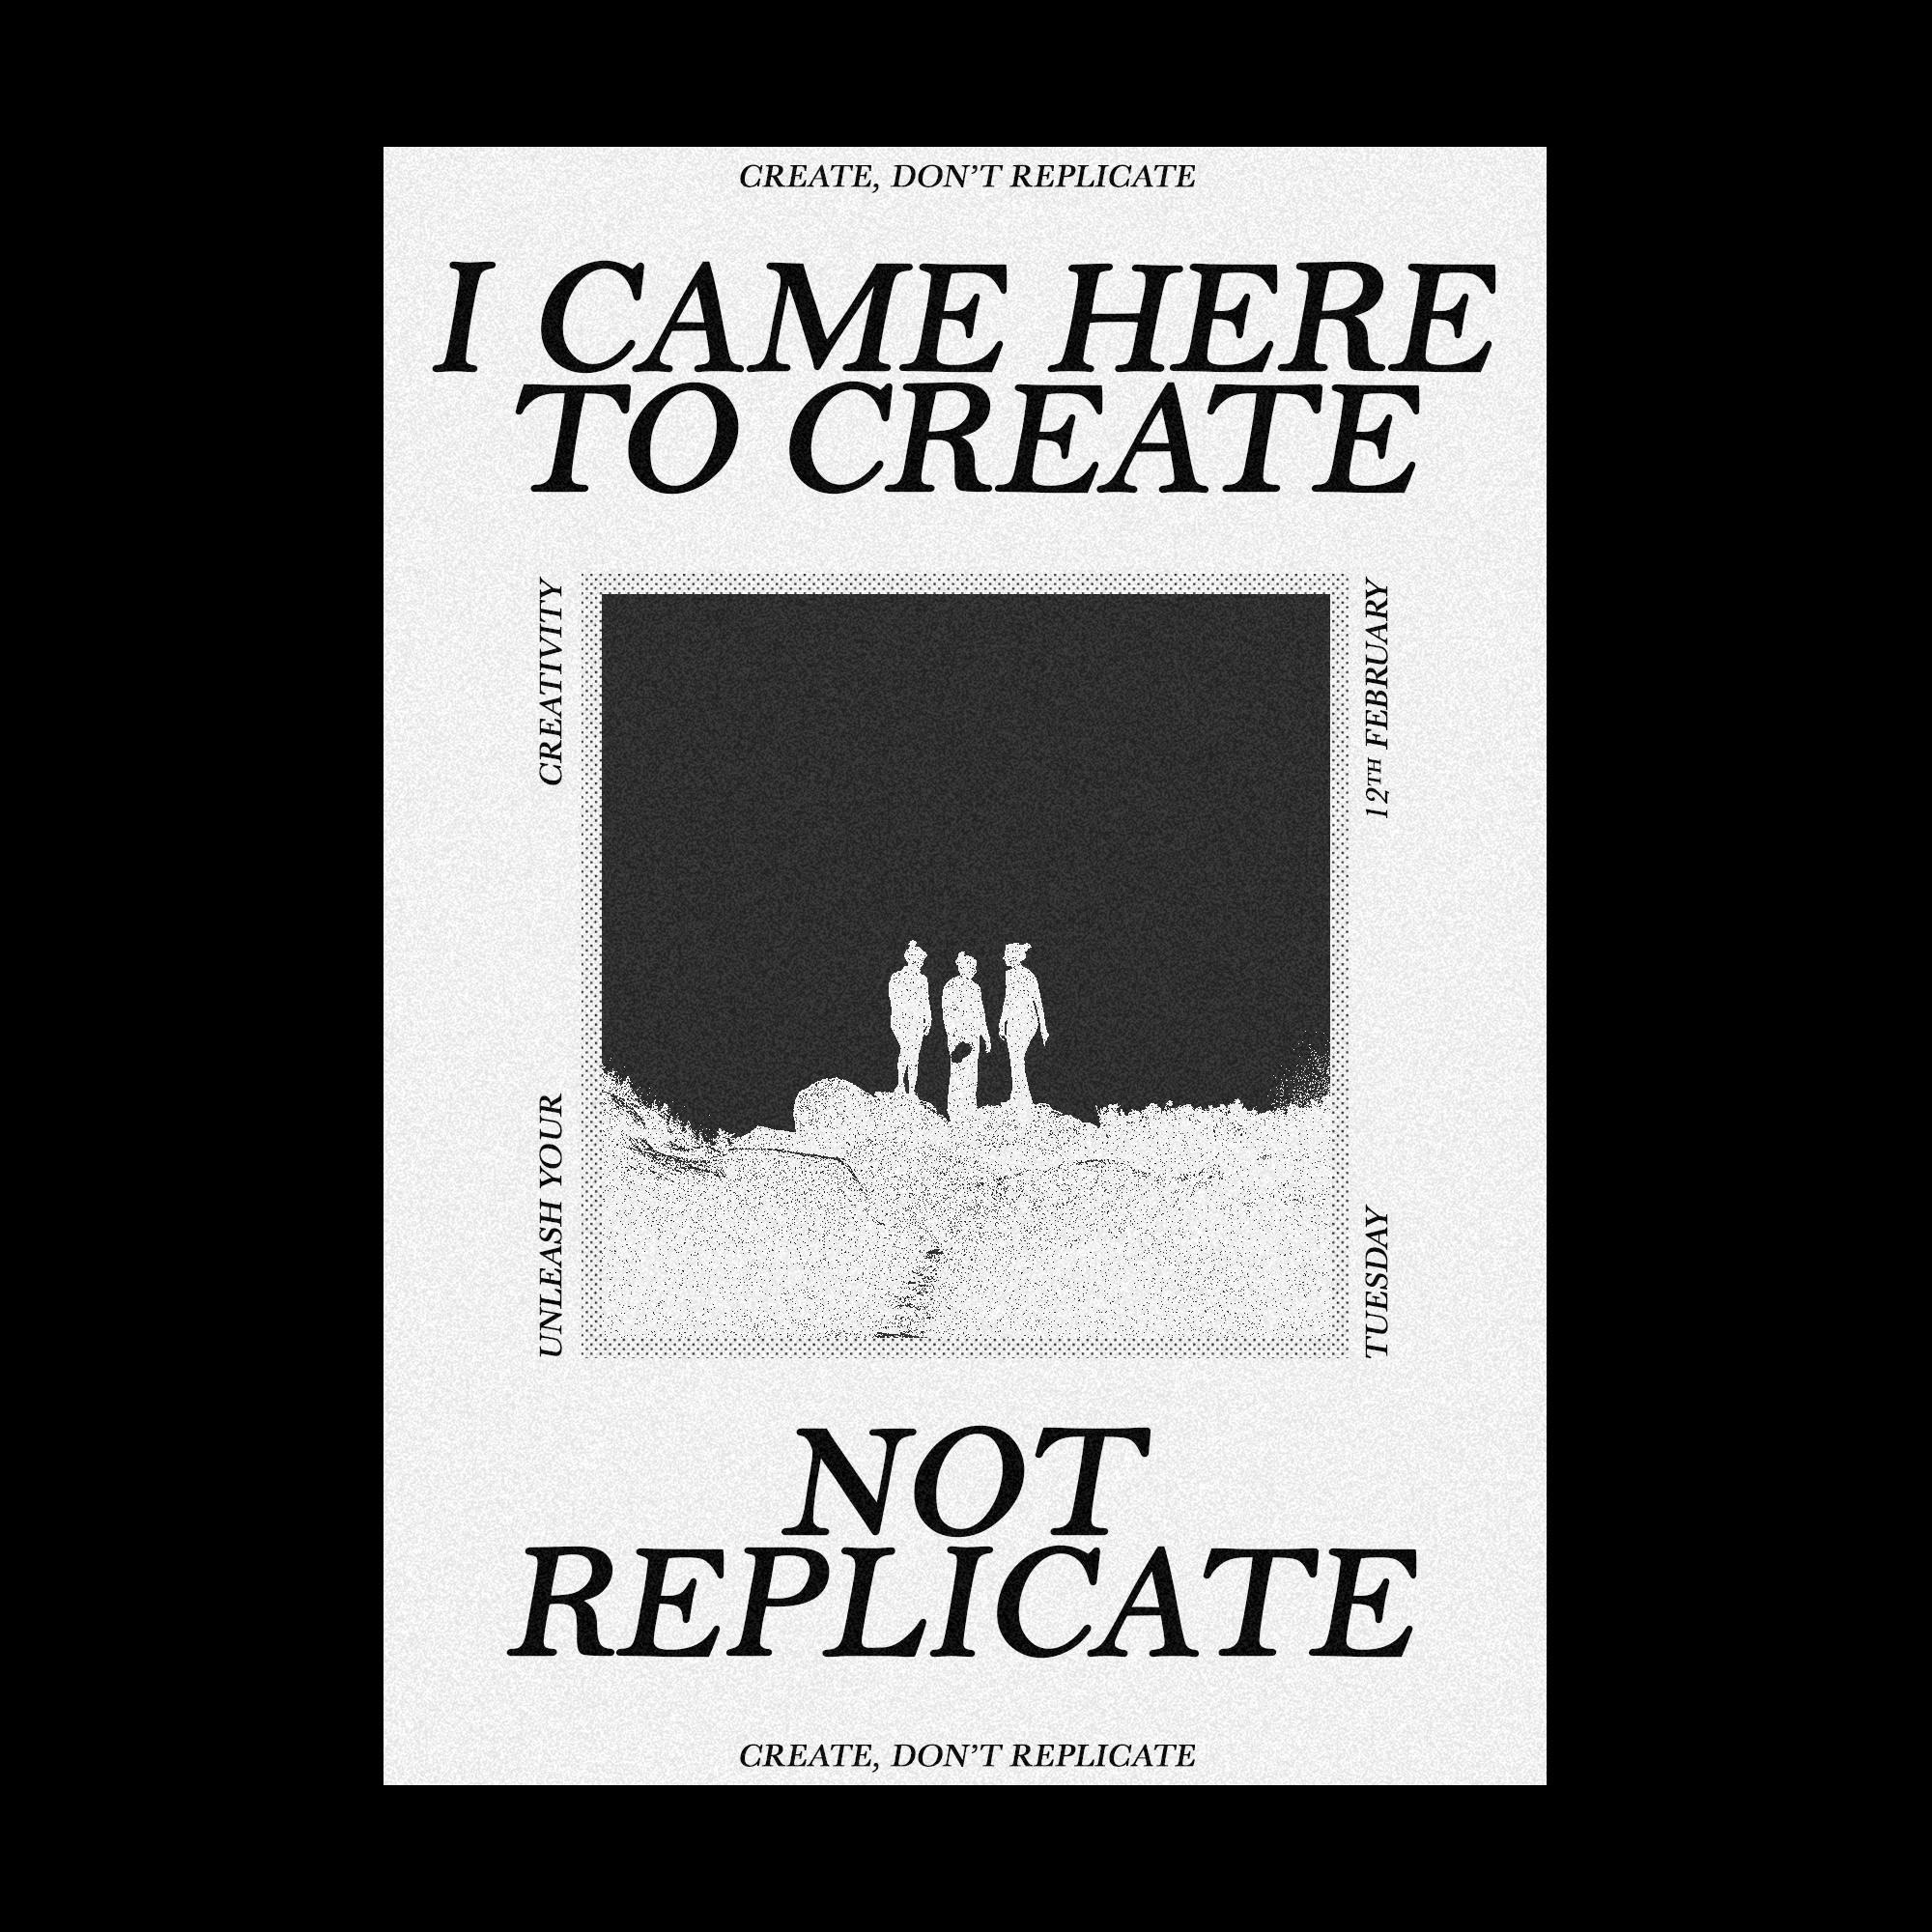 IG_POSTS_I CAM EHERE TO CREATE_2019021201.jpg